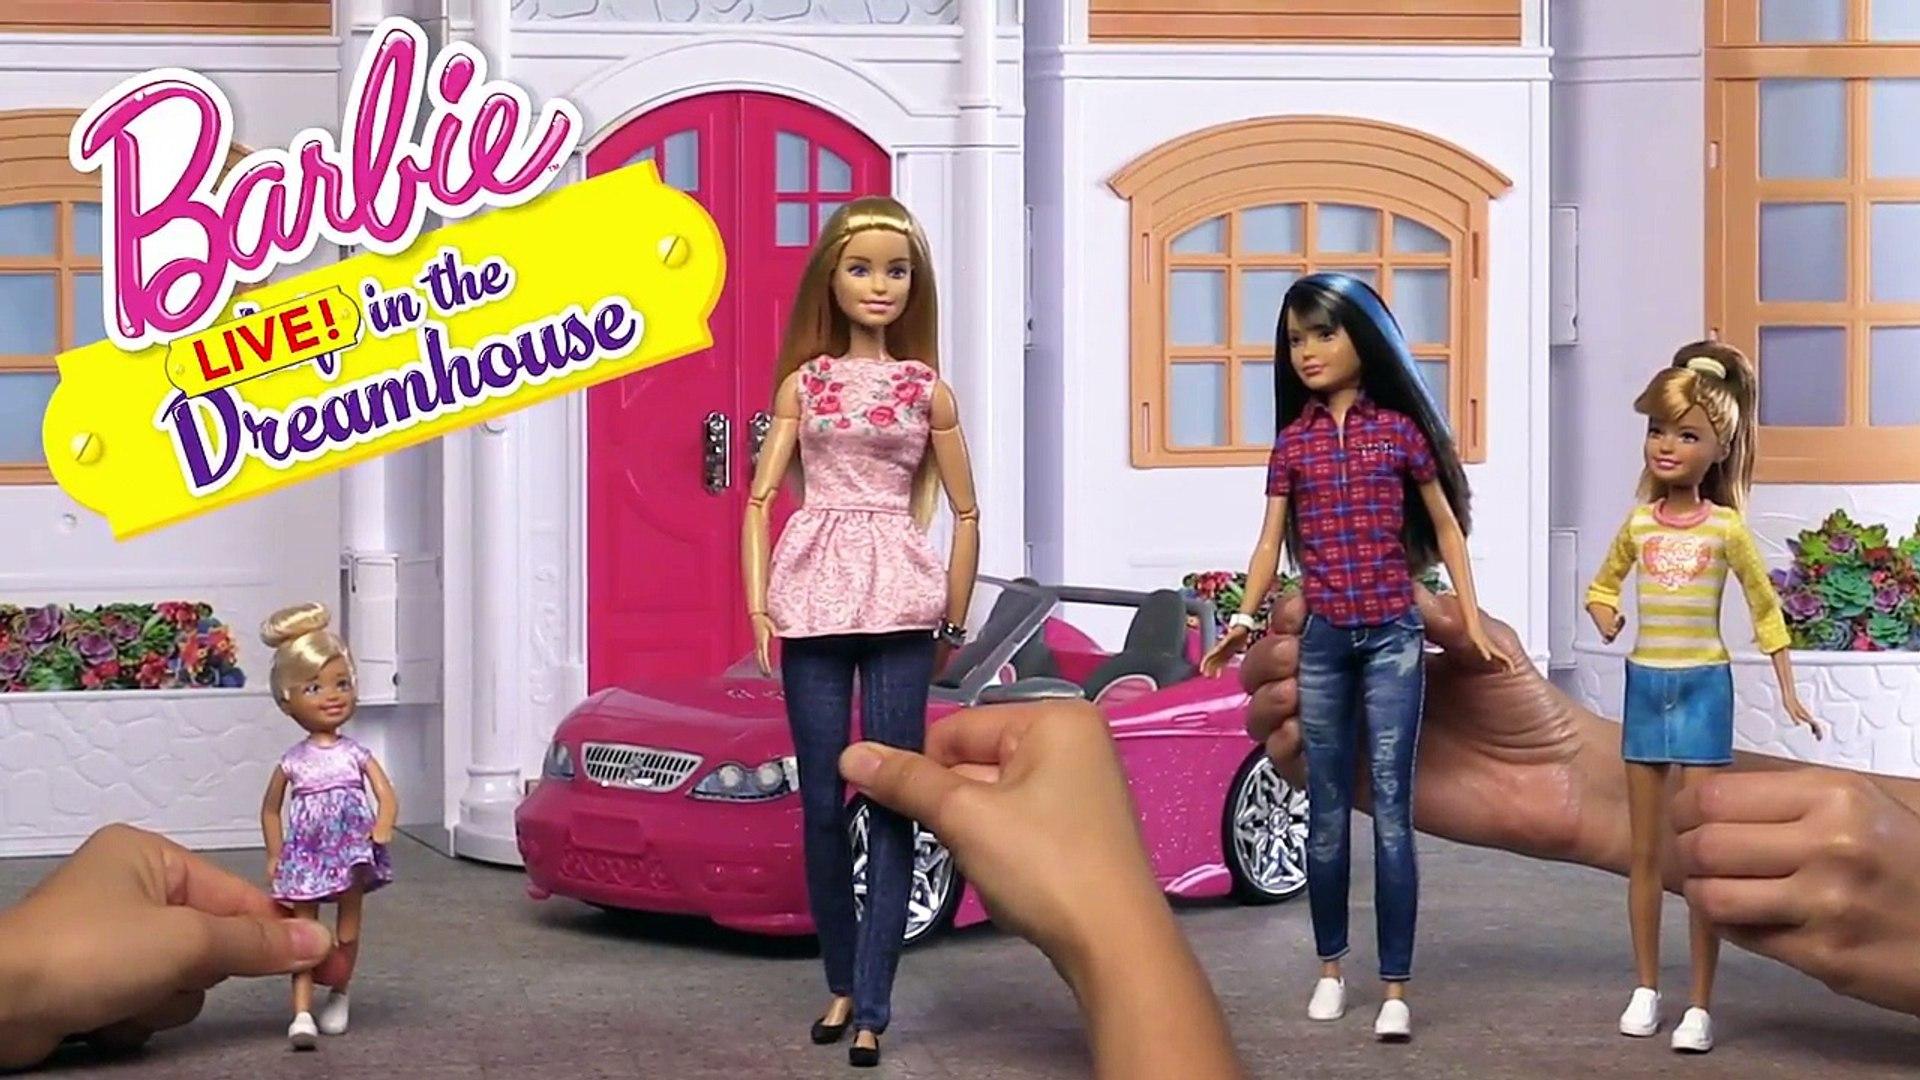 Lékařka Barbie | Barbie LIVE! In The Dreamhouse | Barbie